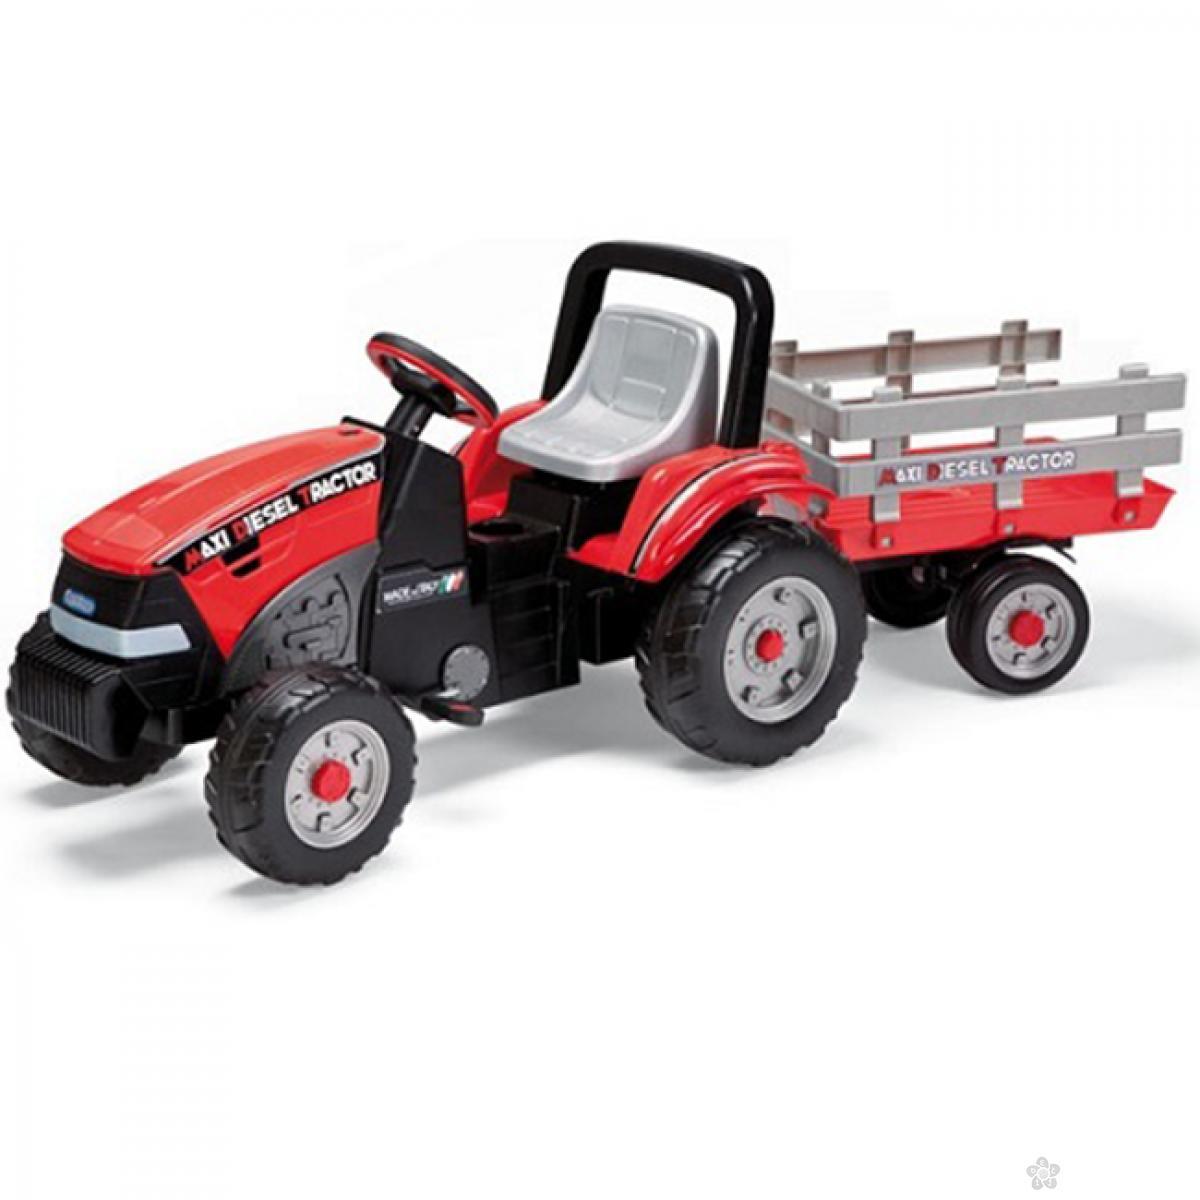 Maxi Diesel Traktor